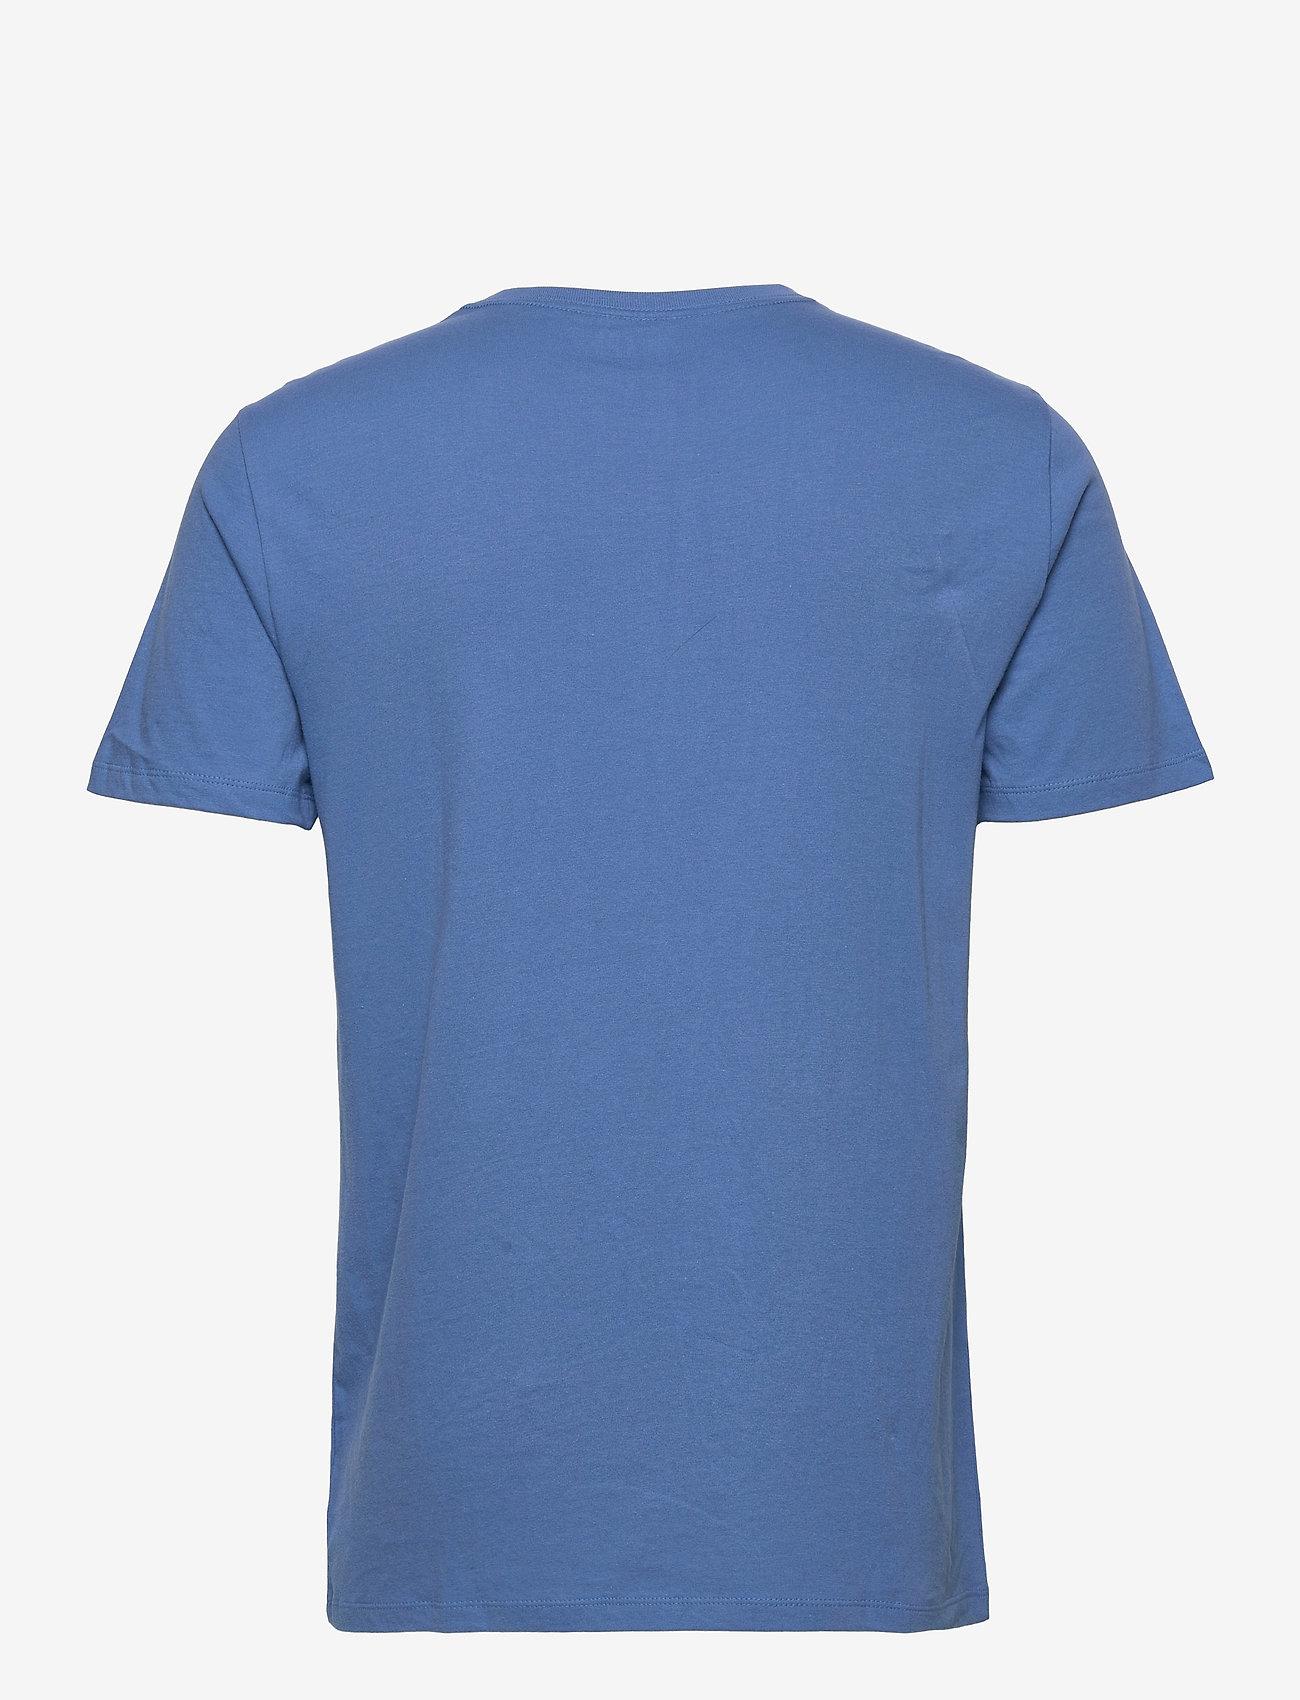 GAP - RAISED ARCH T - t-shirts à manches courtes - northern blue 330-540 - 1